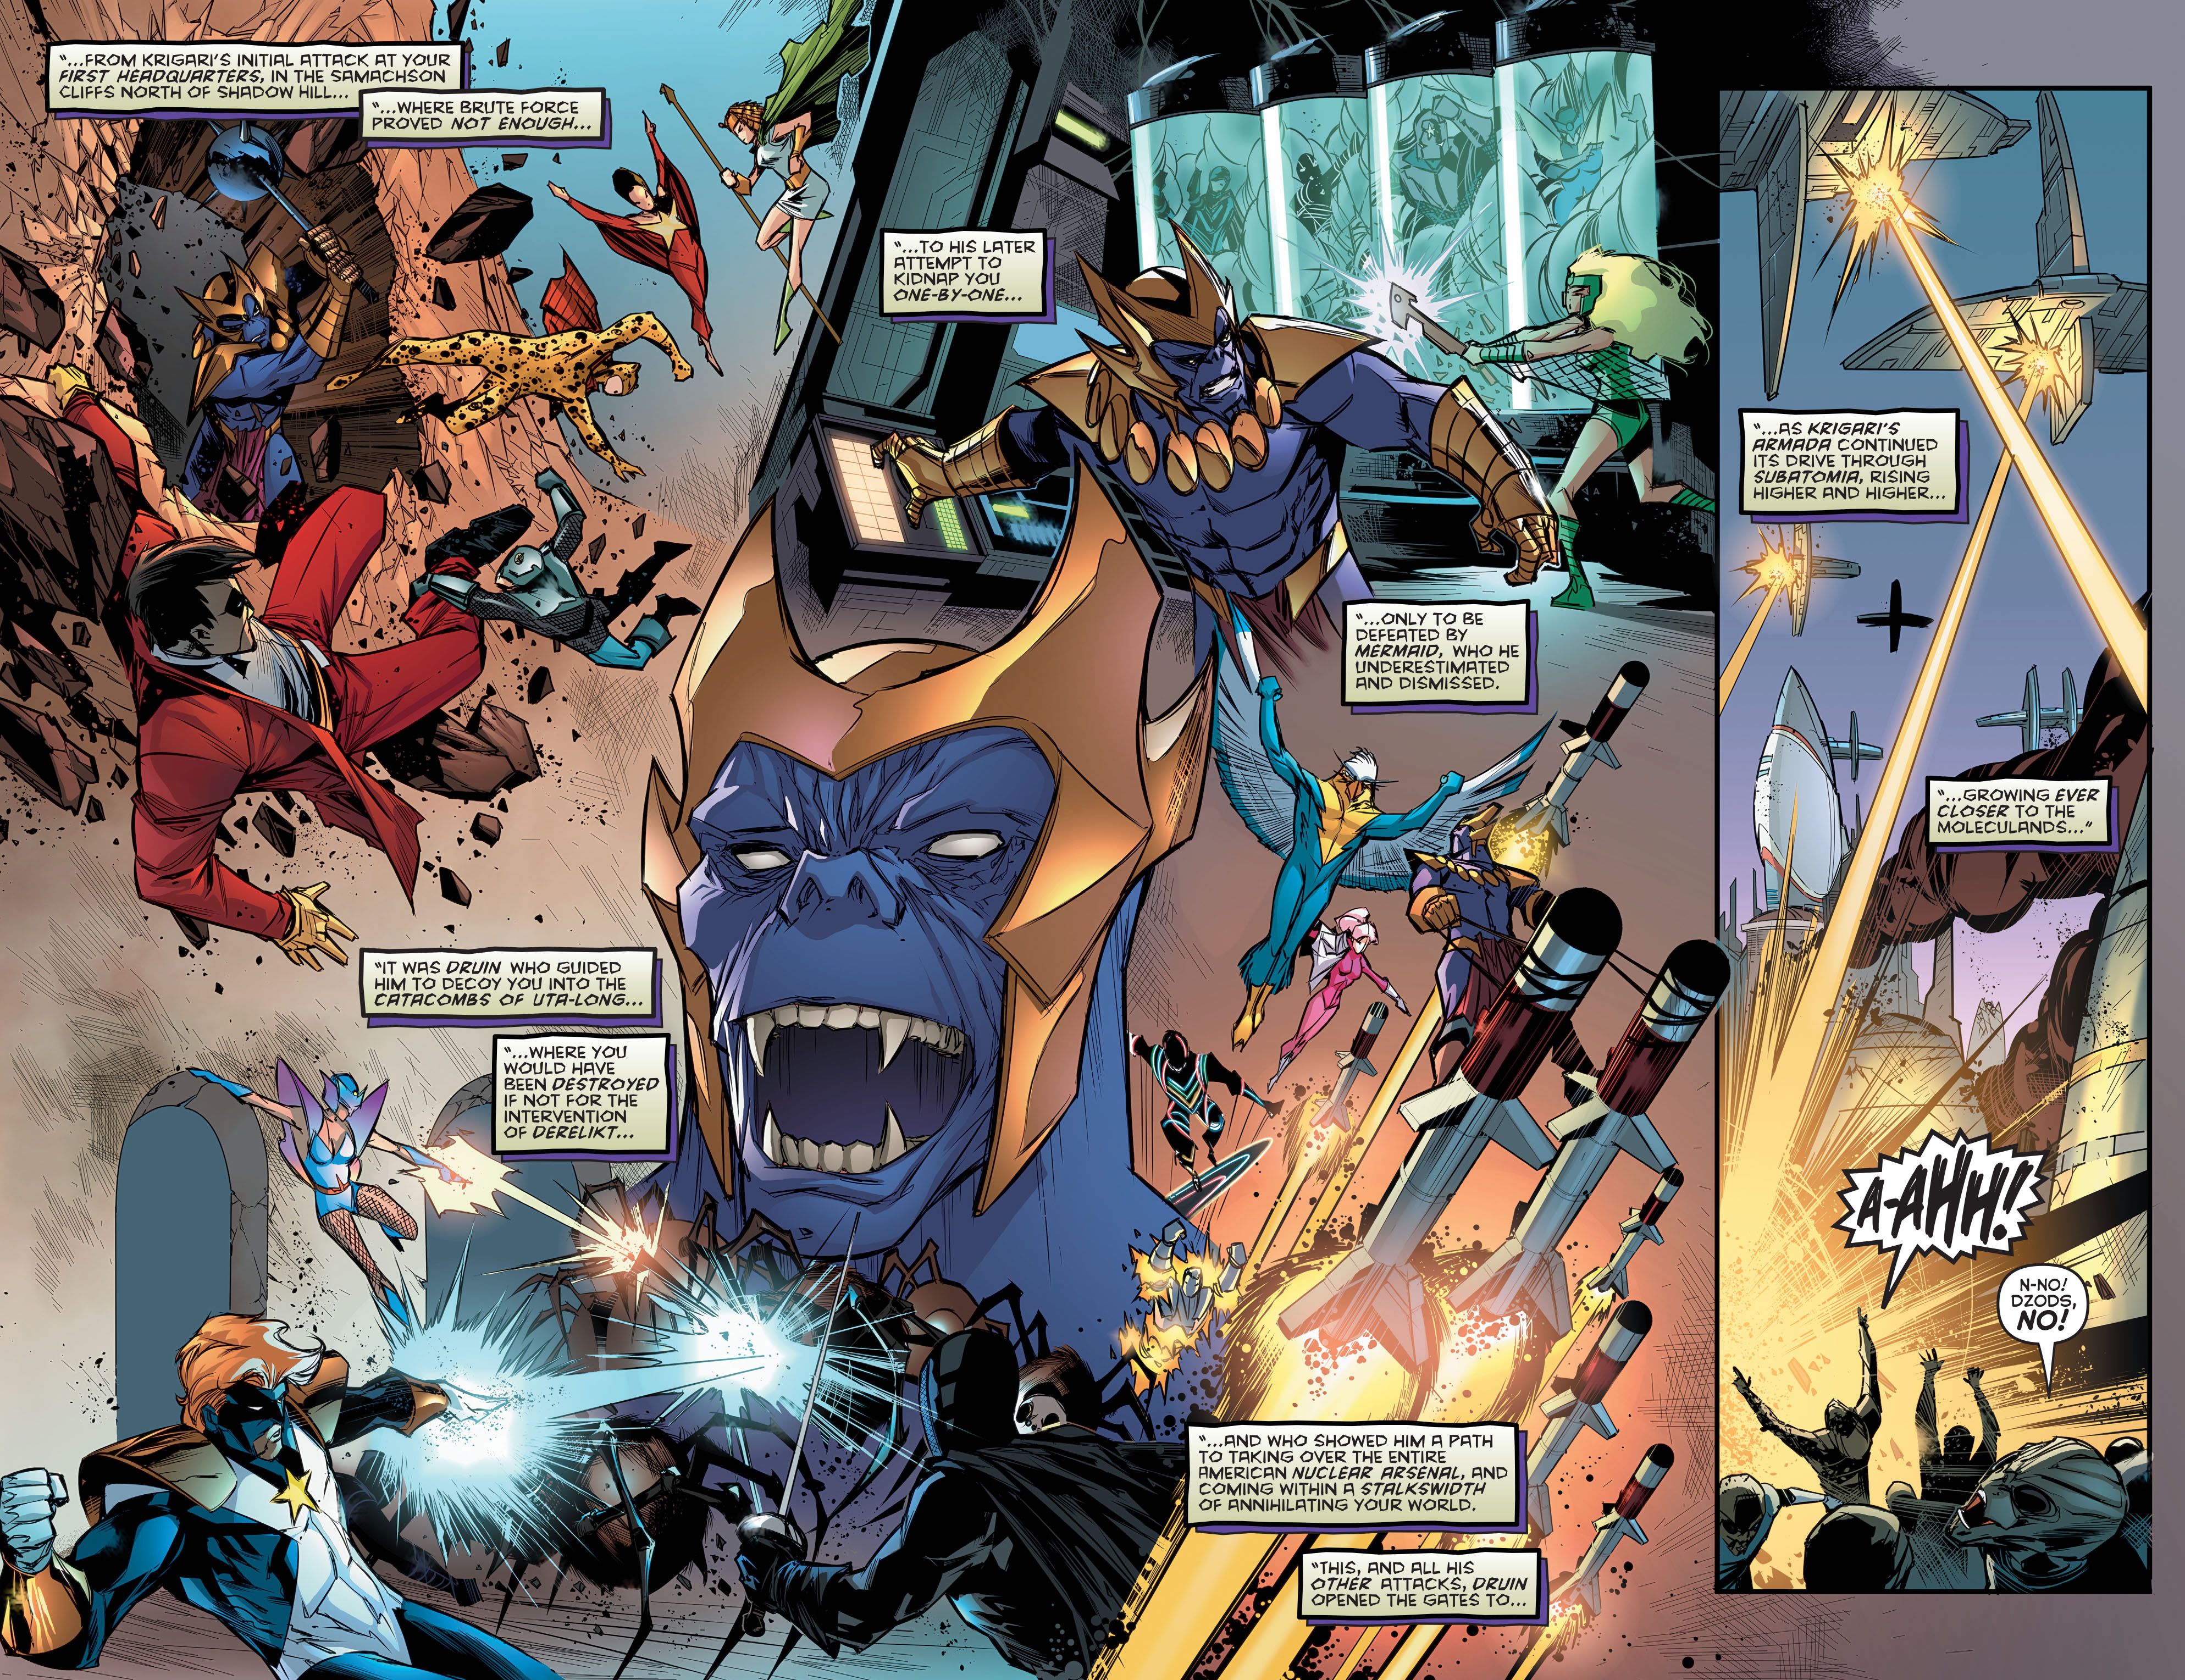 Read online Astro City comic -  Issue #17 - 13